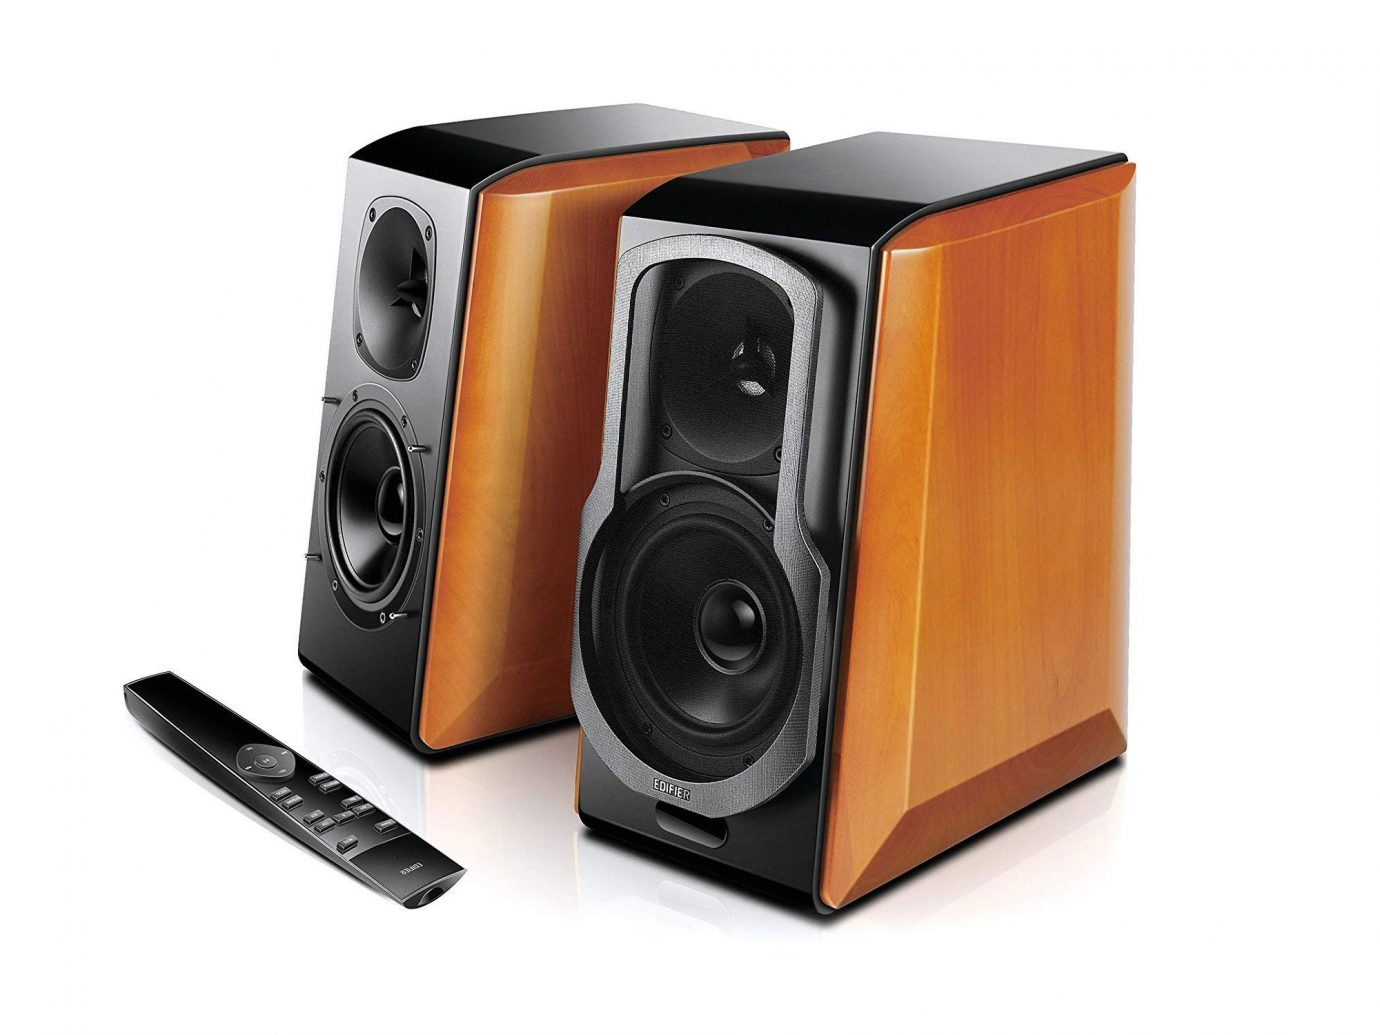 Edifier S2000pro Powered Bluetooth Bookshelf Speakers on Amazon